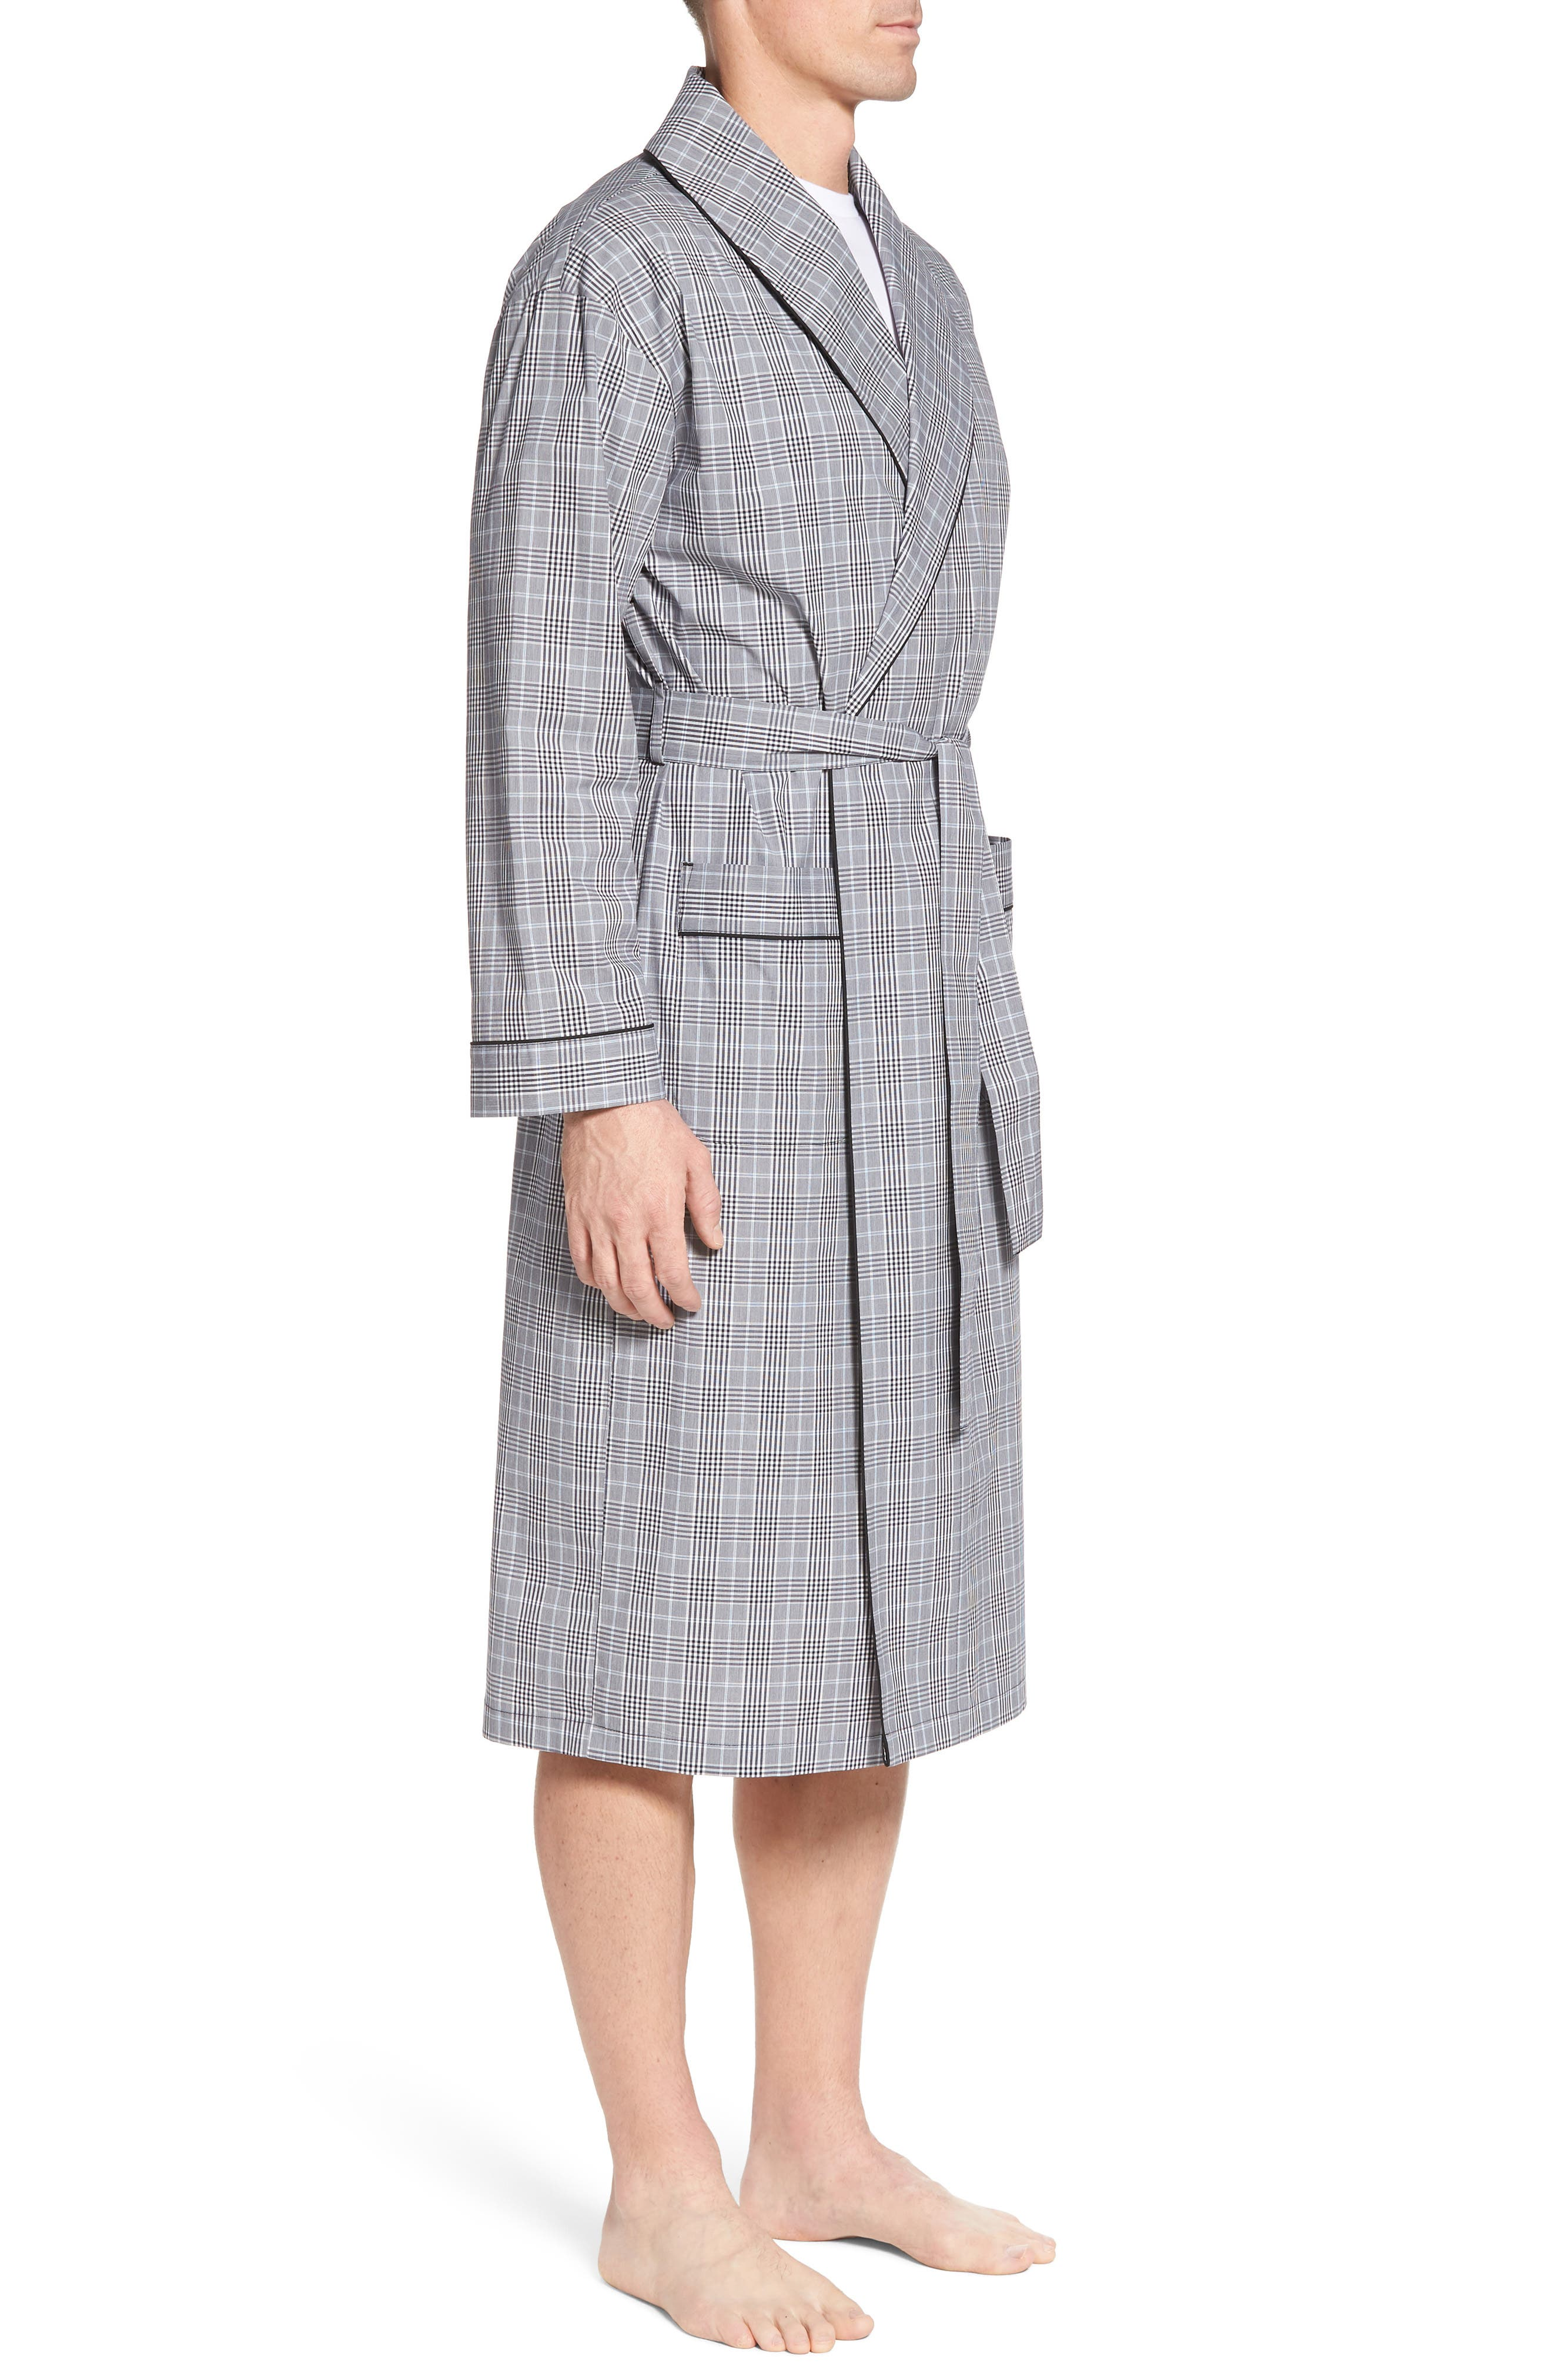 Charleston Robe,                             Alternate thumbnail 3, color,                             BLACK PLAID